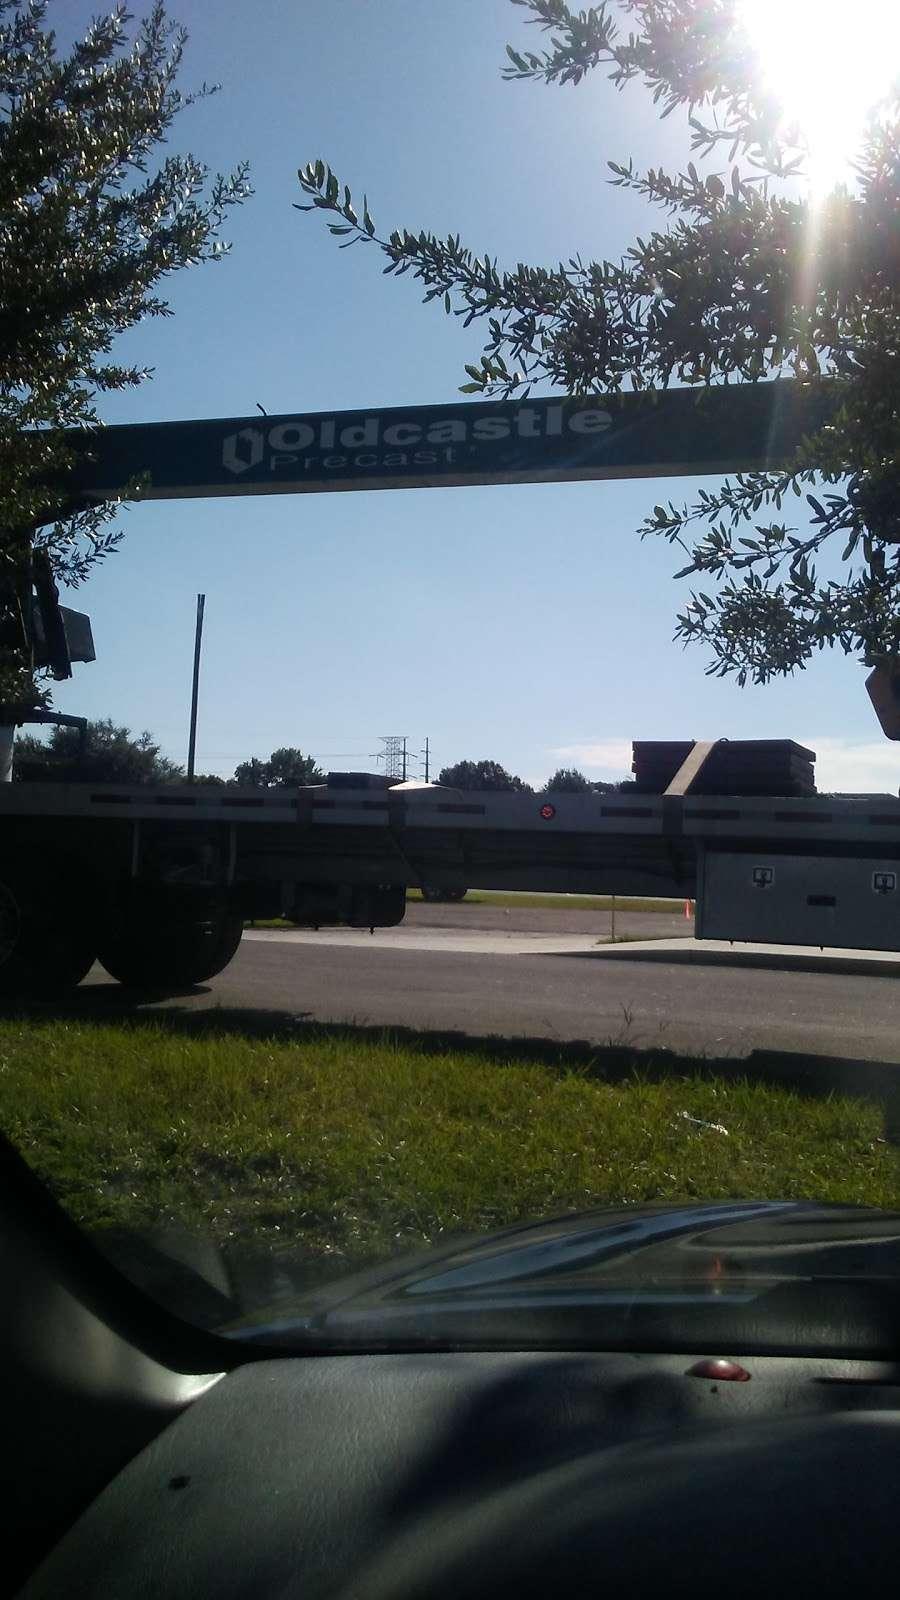 Liberty Middle School - school  | Photo 6 of 6 | Address: 3405 S Chickasaw Trail, Orlando, FL 32829, USA | Phone: (407) 249-6440